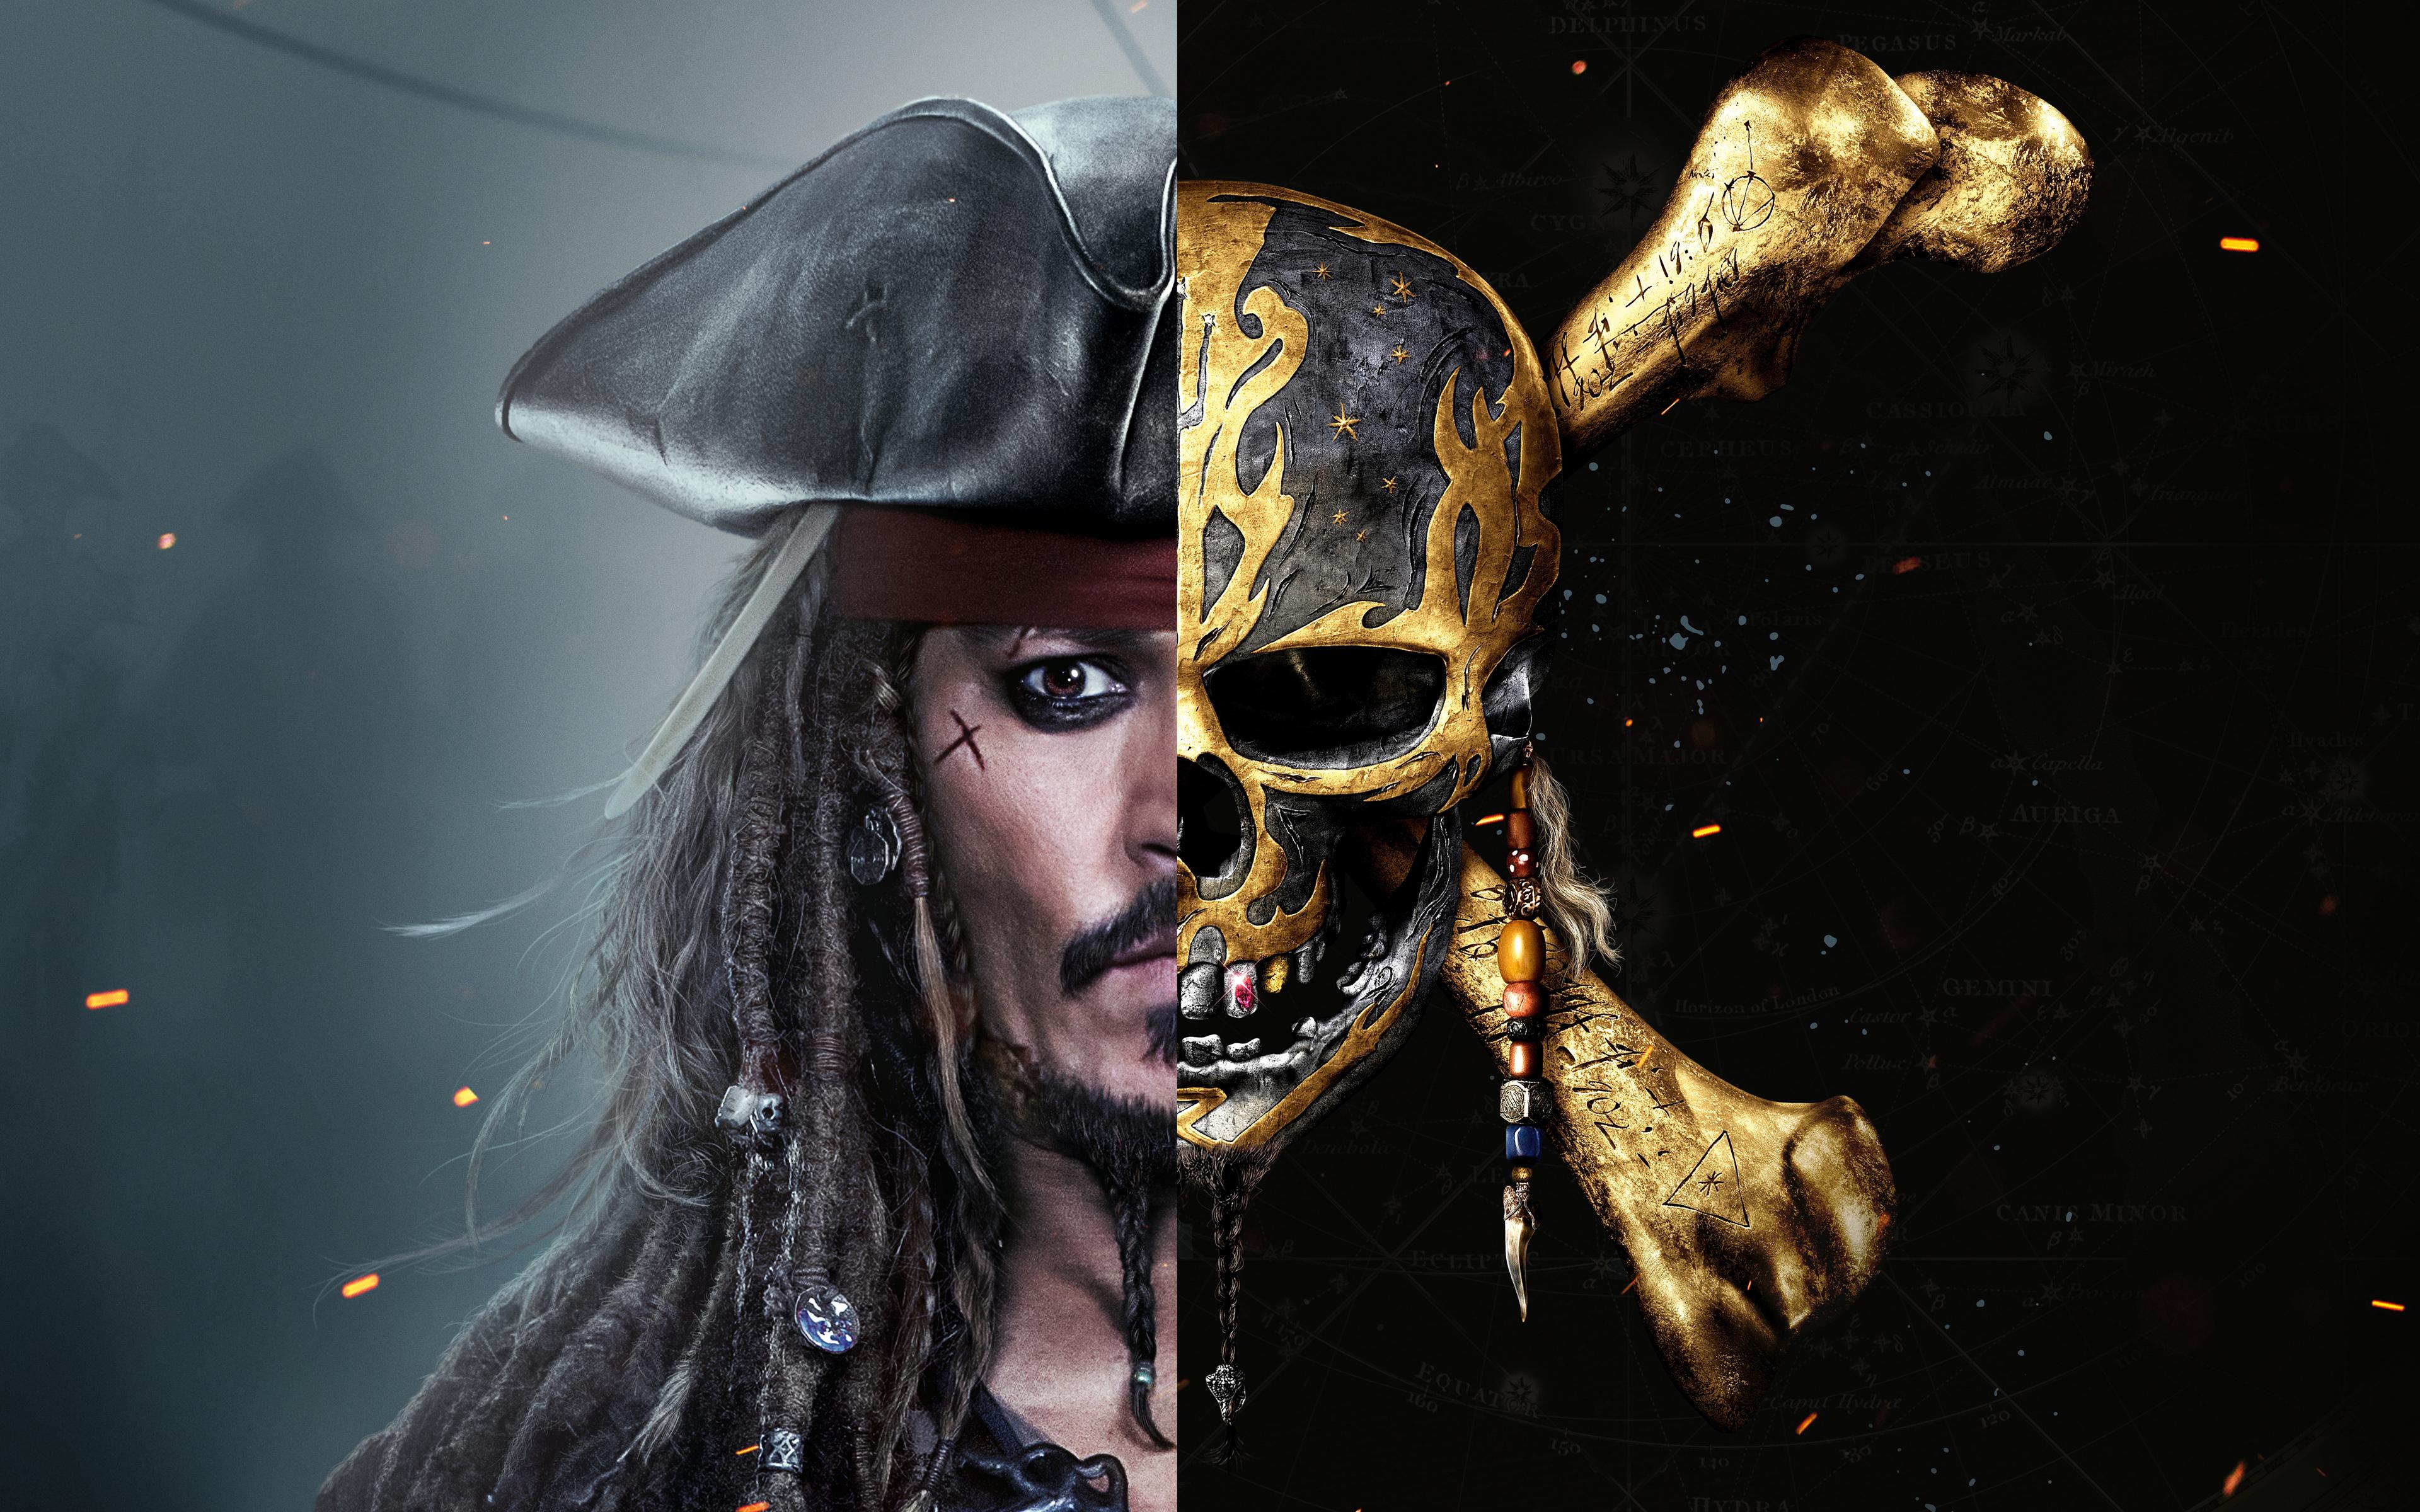 Pirates Of The Caribbean Jack Sparrow Pirates Skull Pirates Of The Caribbean Dead Men Tell No Tales 3840x2400